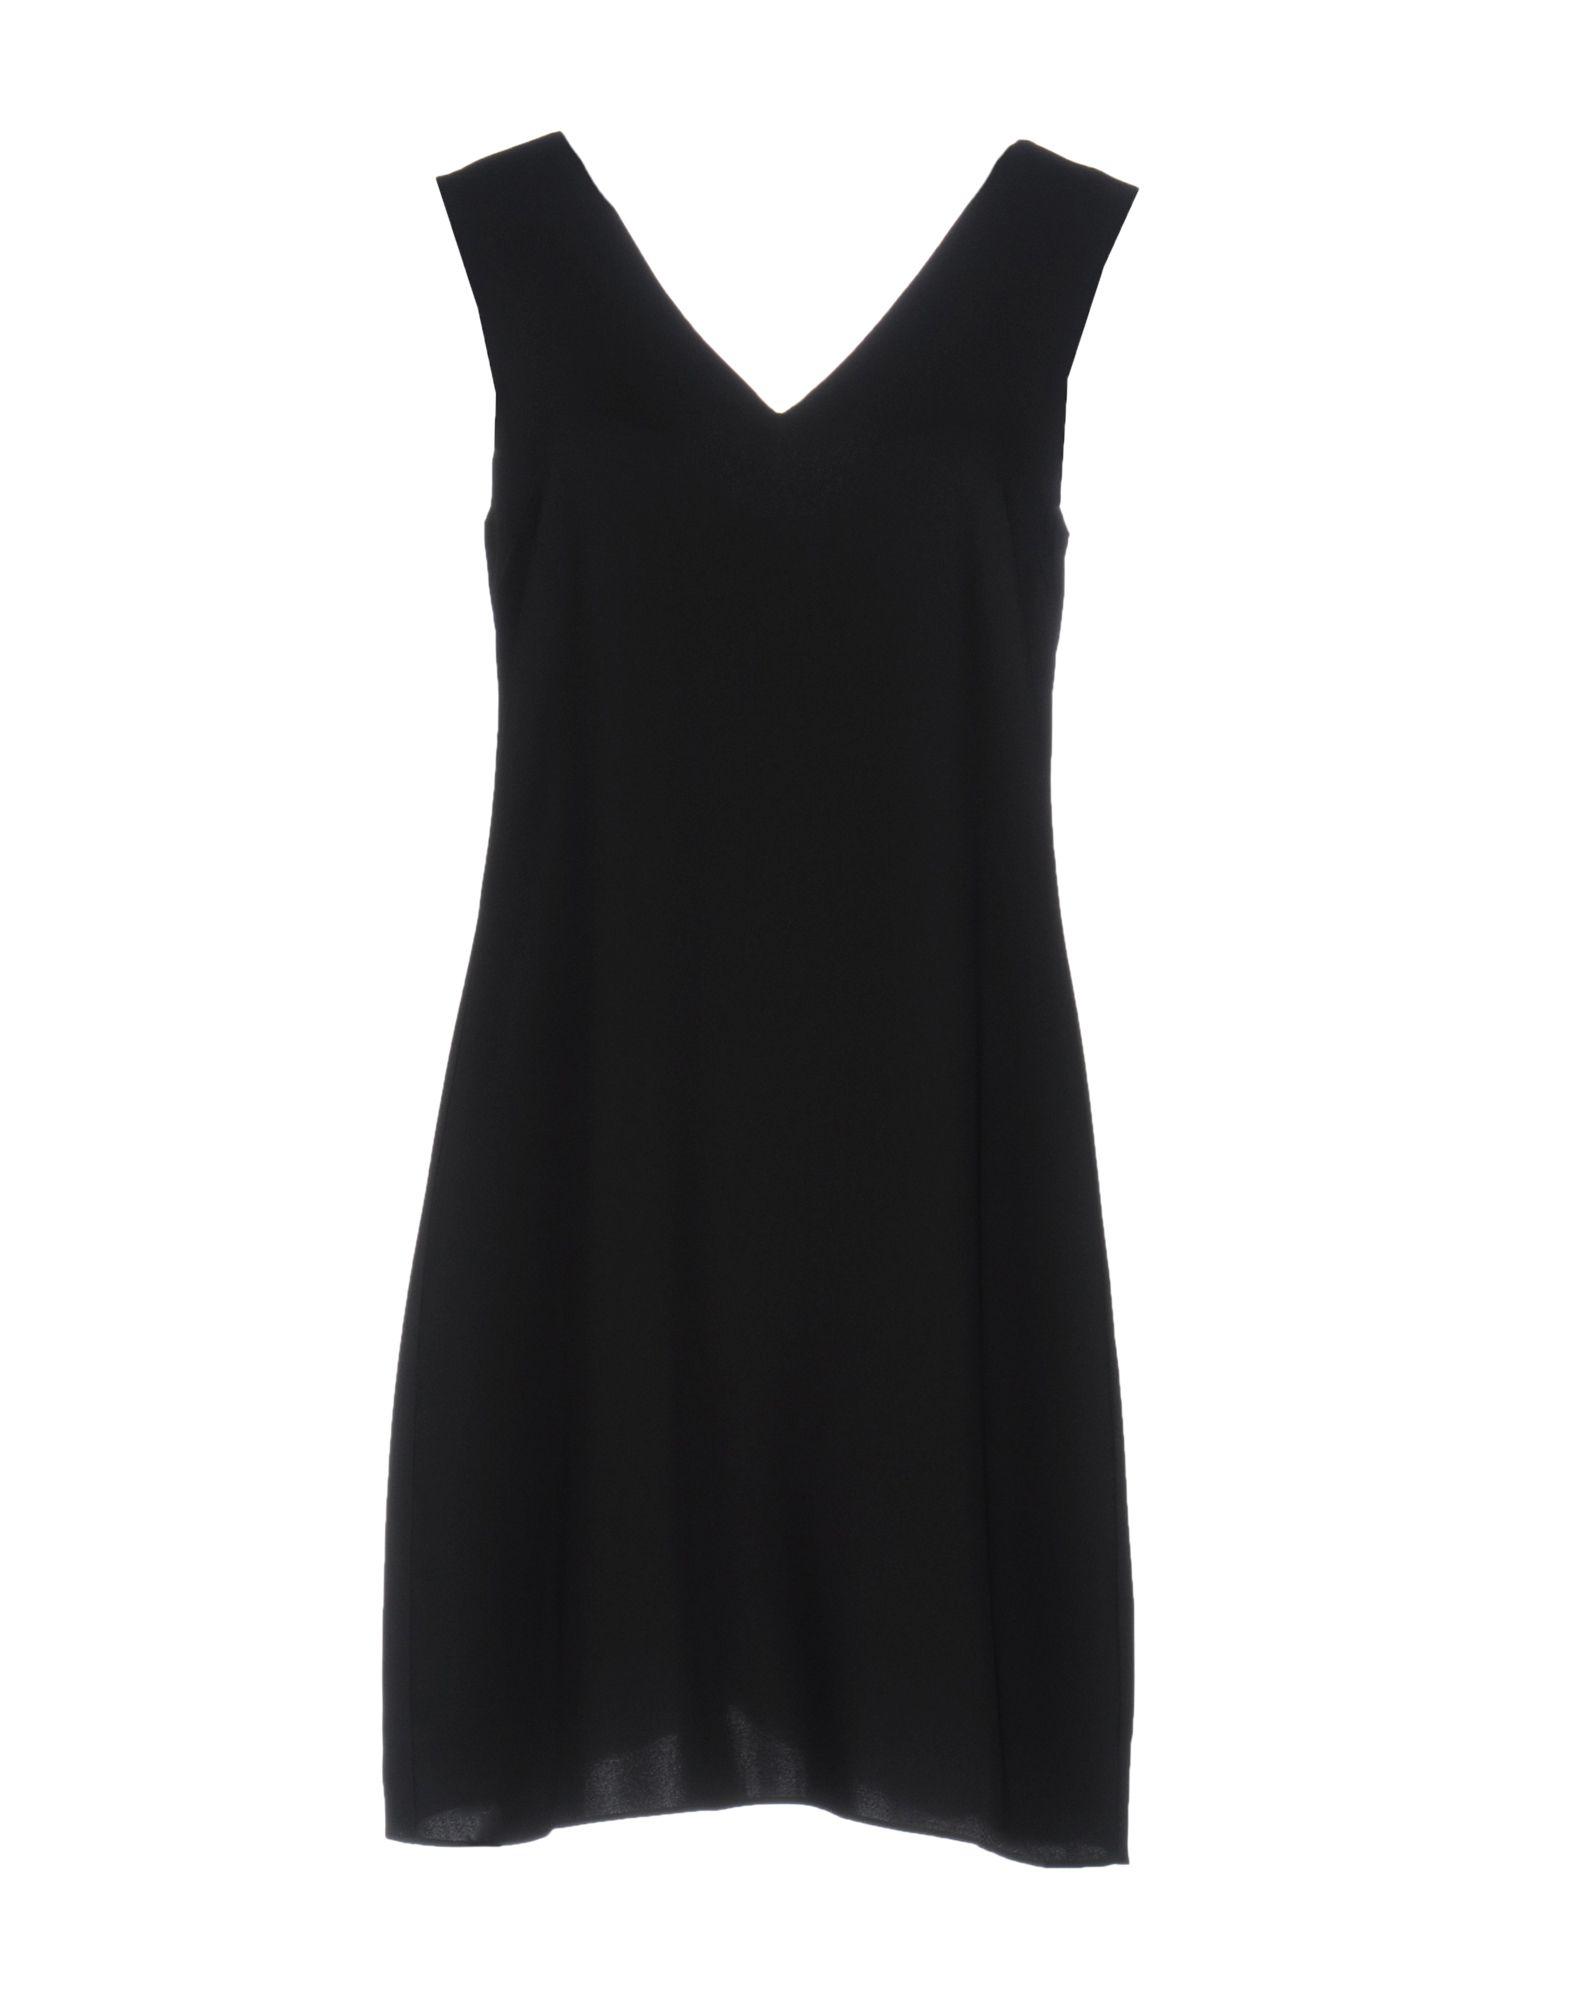 COOPER & ELLA Short Dress in Black